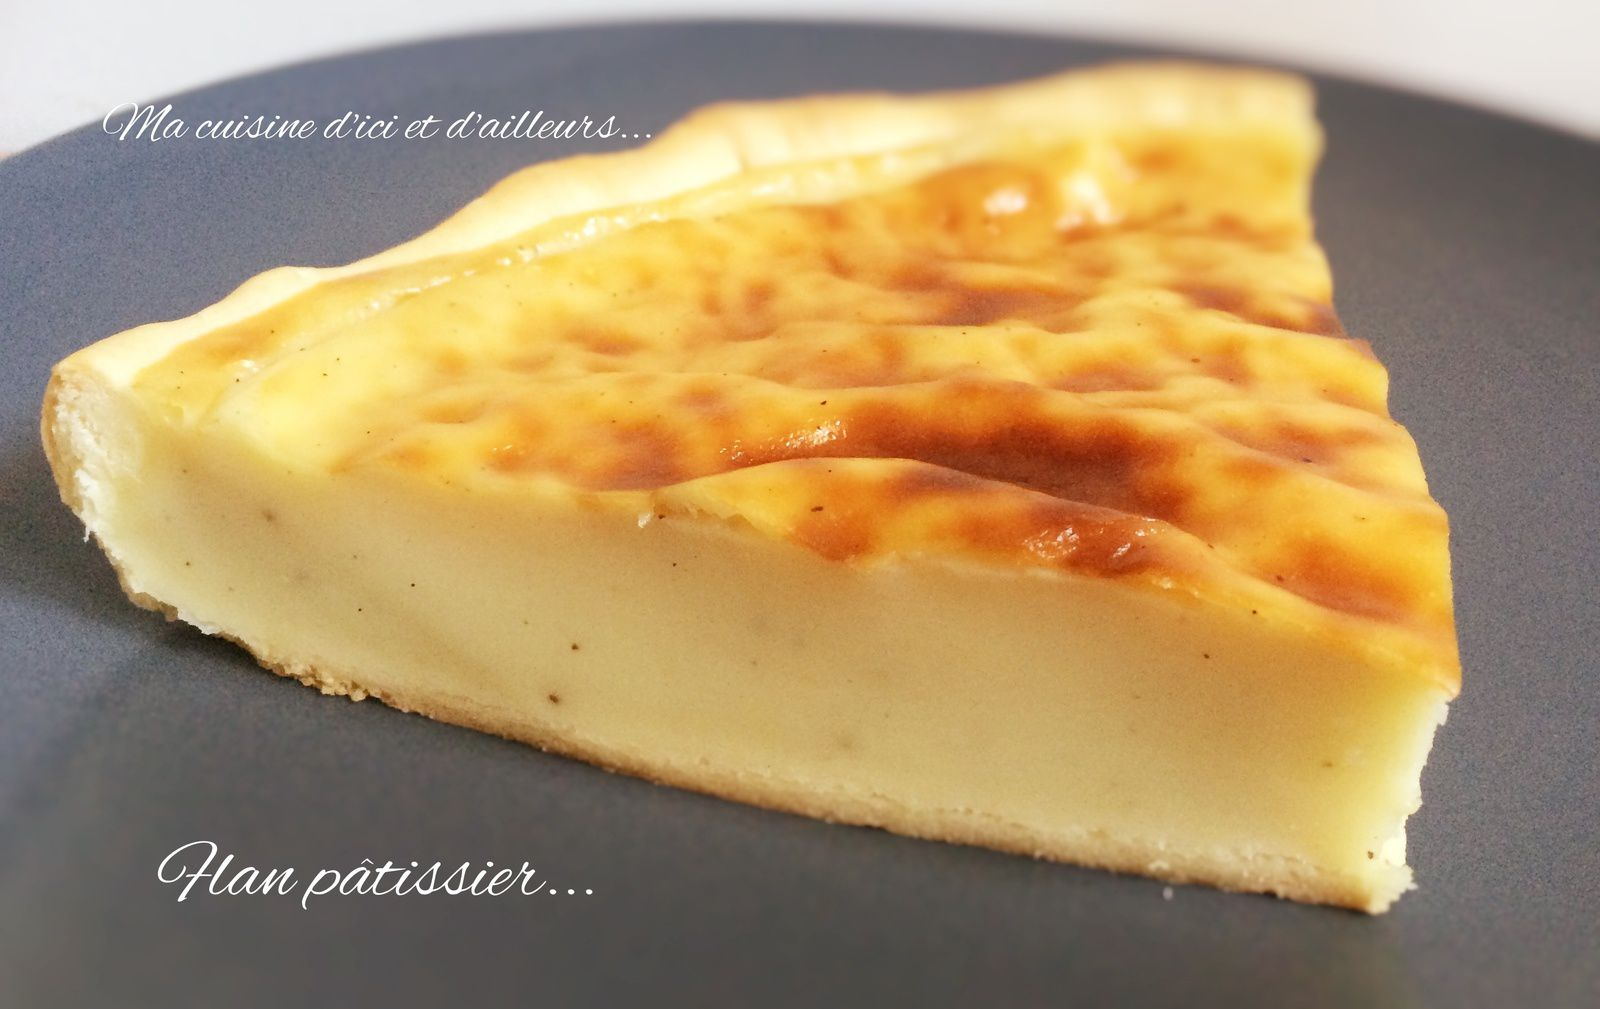 Flan pâtissier...